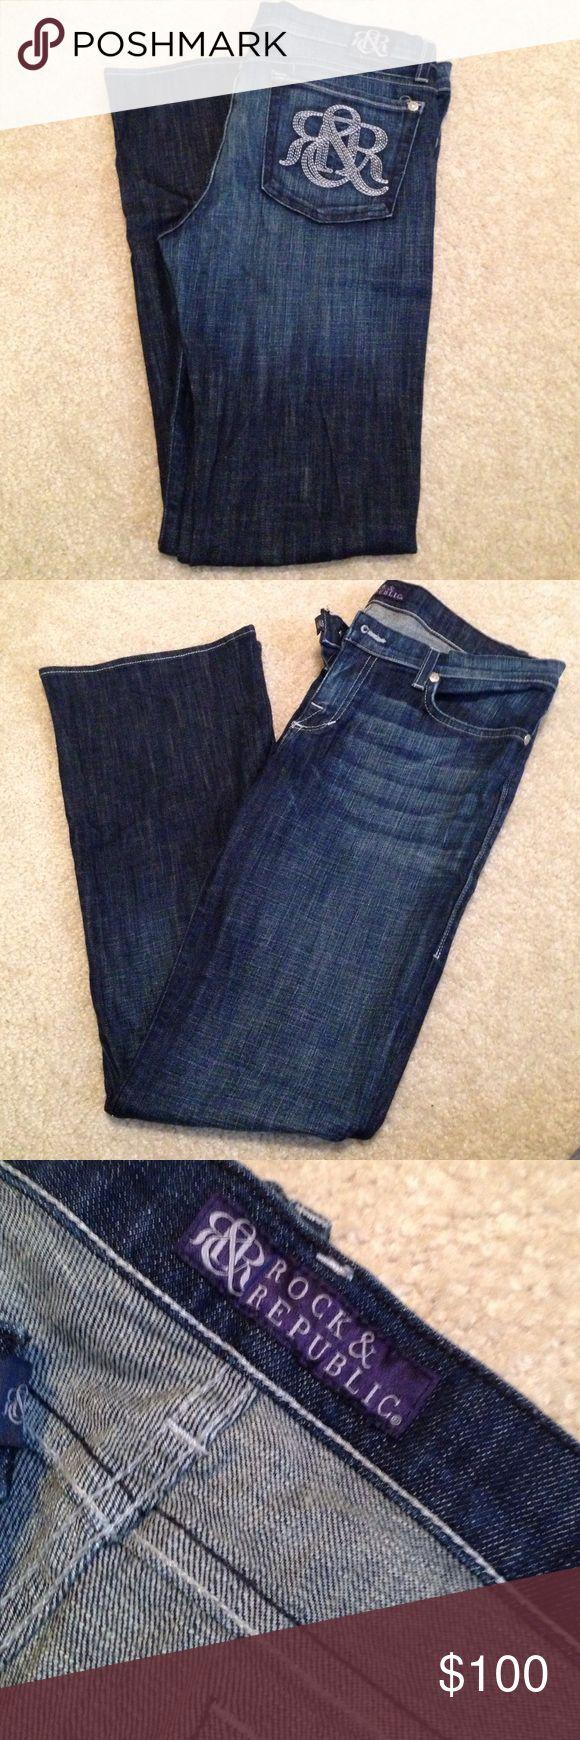 Rock & Republic jeans 31 in inseam. Great condition Rock & Republic Jeans Boot Cut